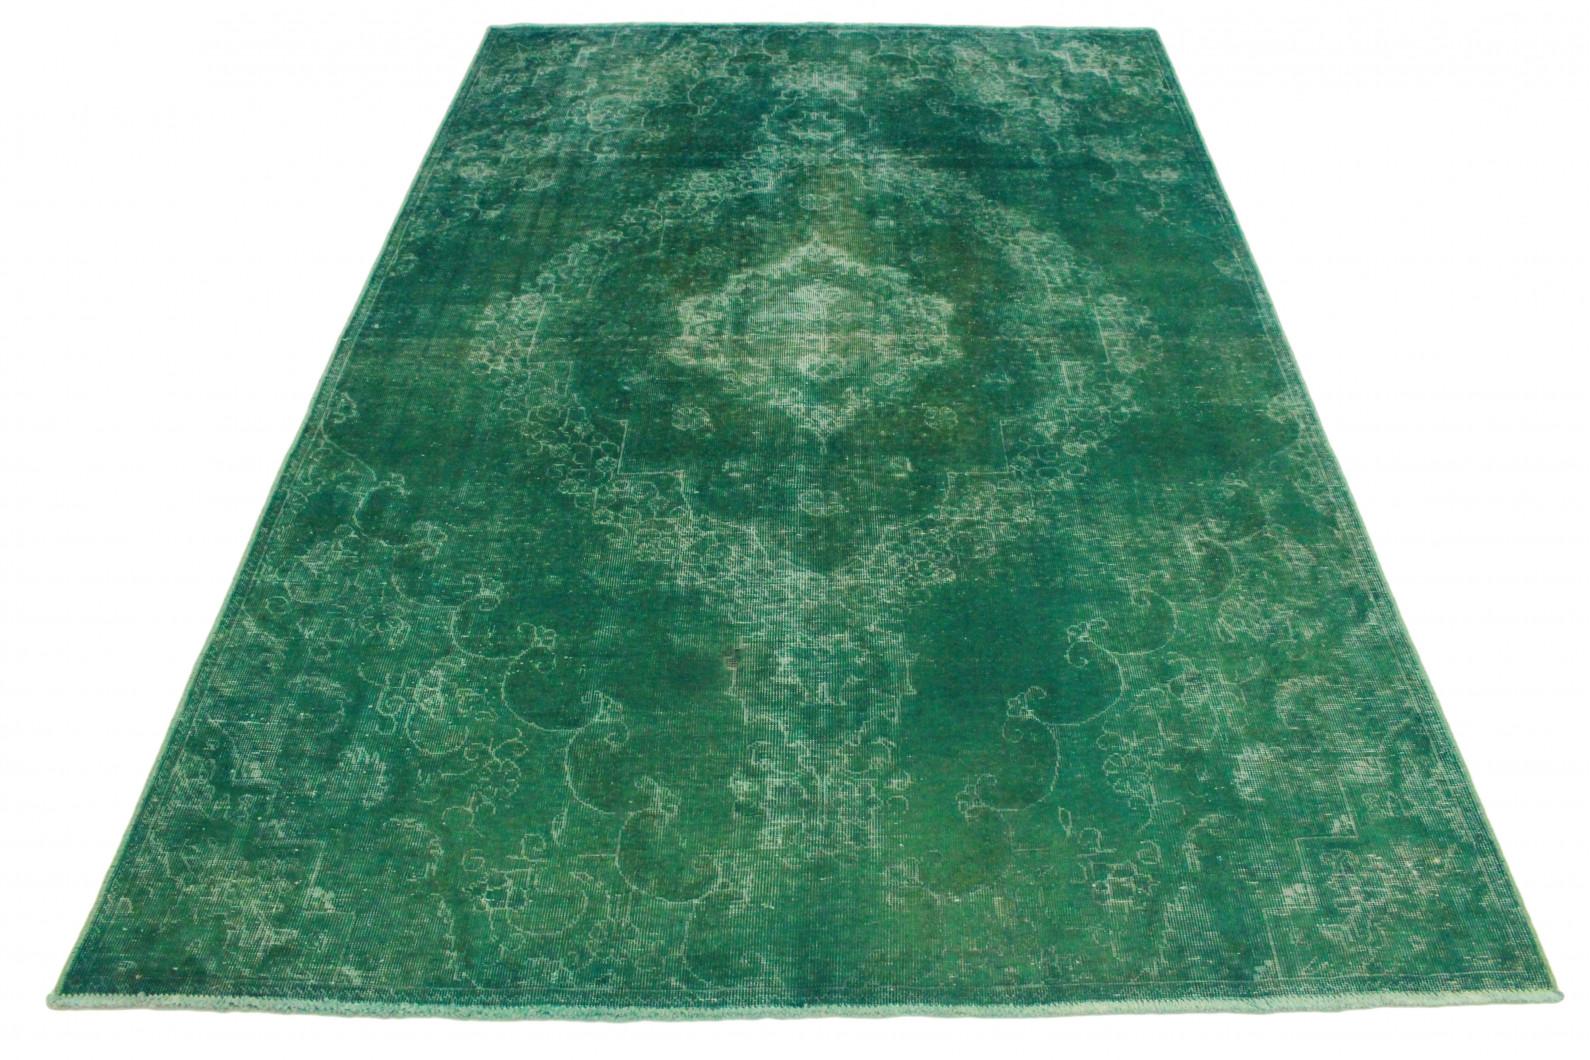 vintage teppich gr n t rkis in 300x200 1001 3539 bei kaufen. Black Bedroom Furniture Sets. Home Design Ideas